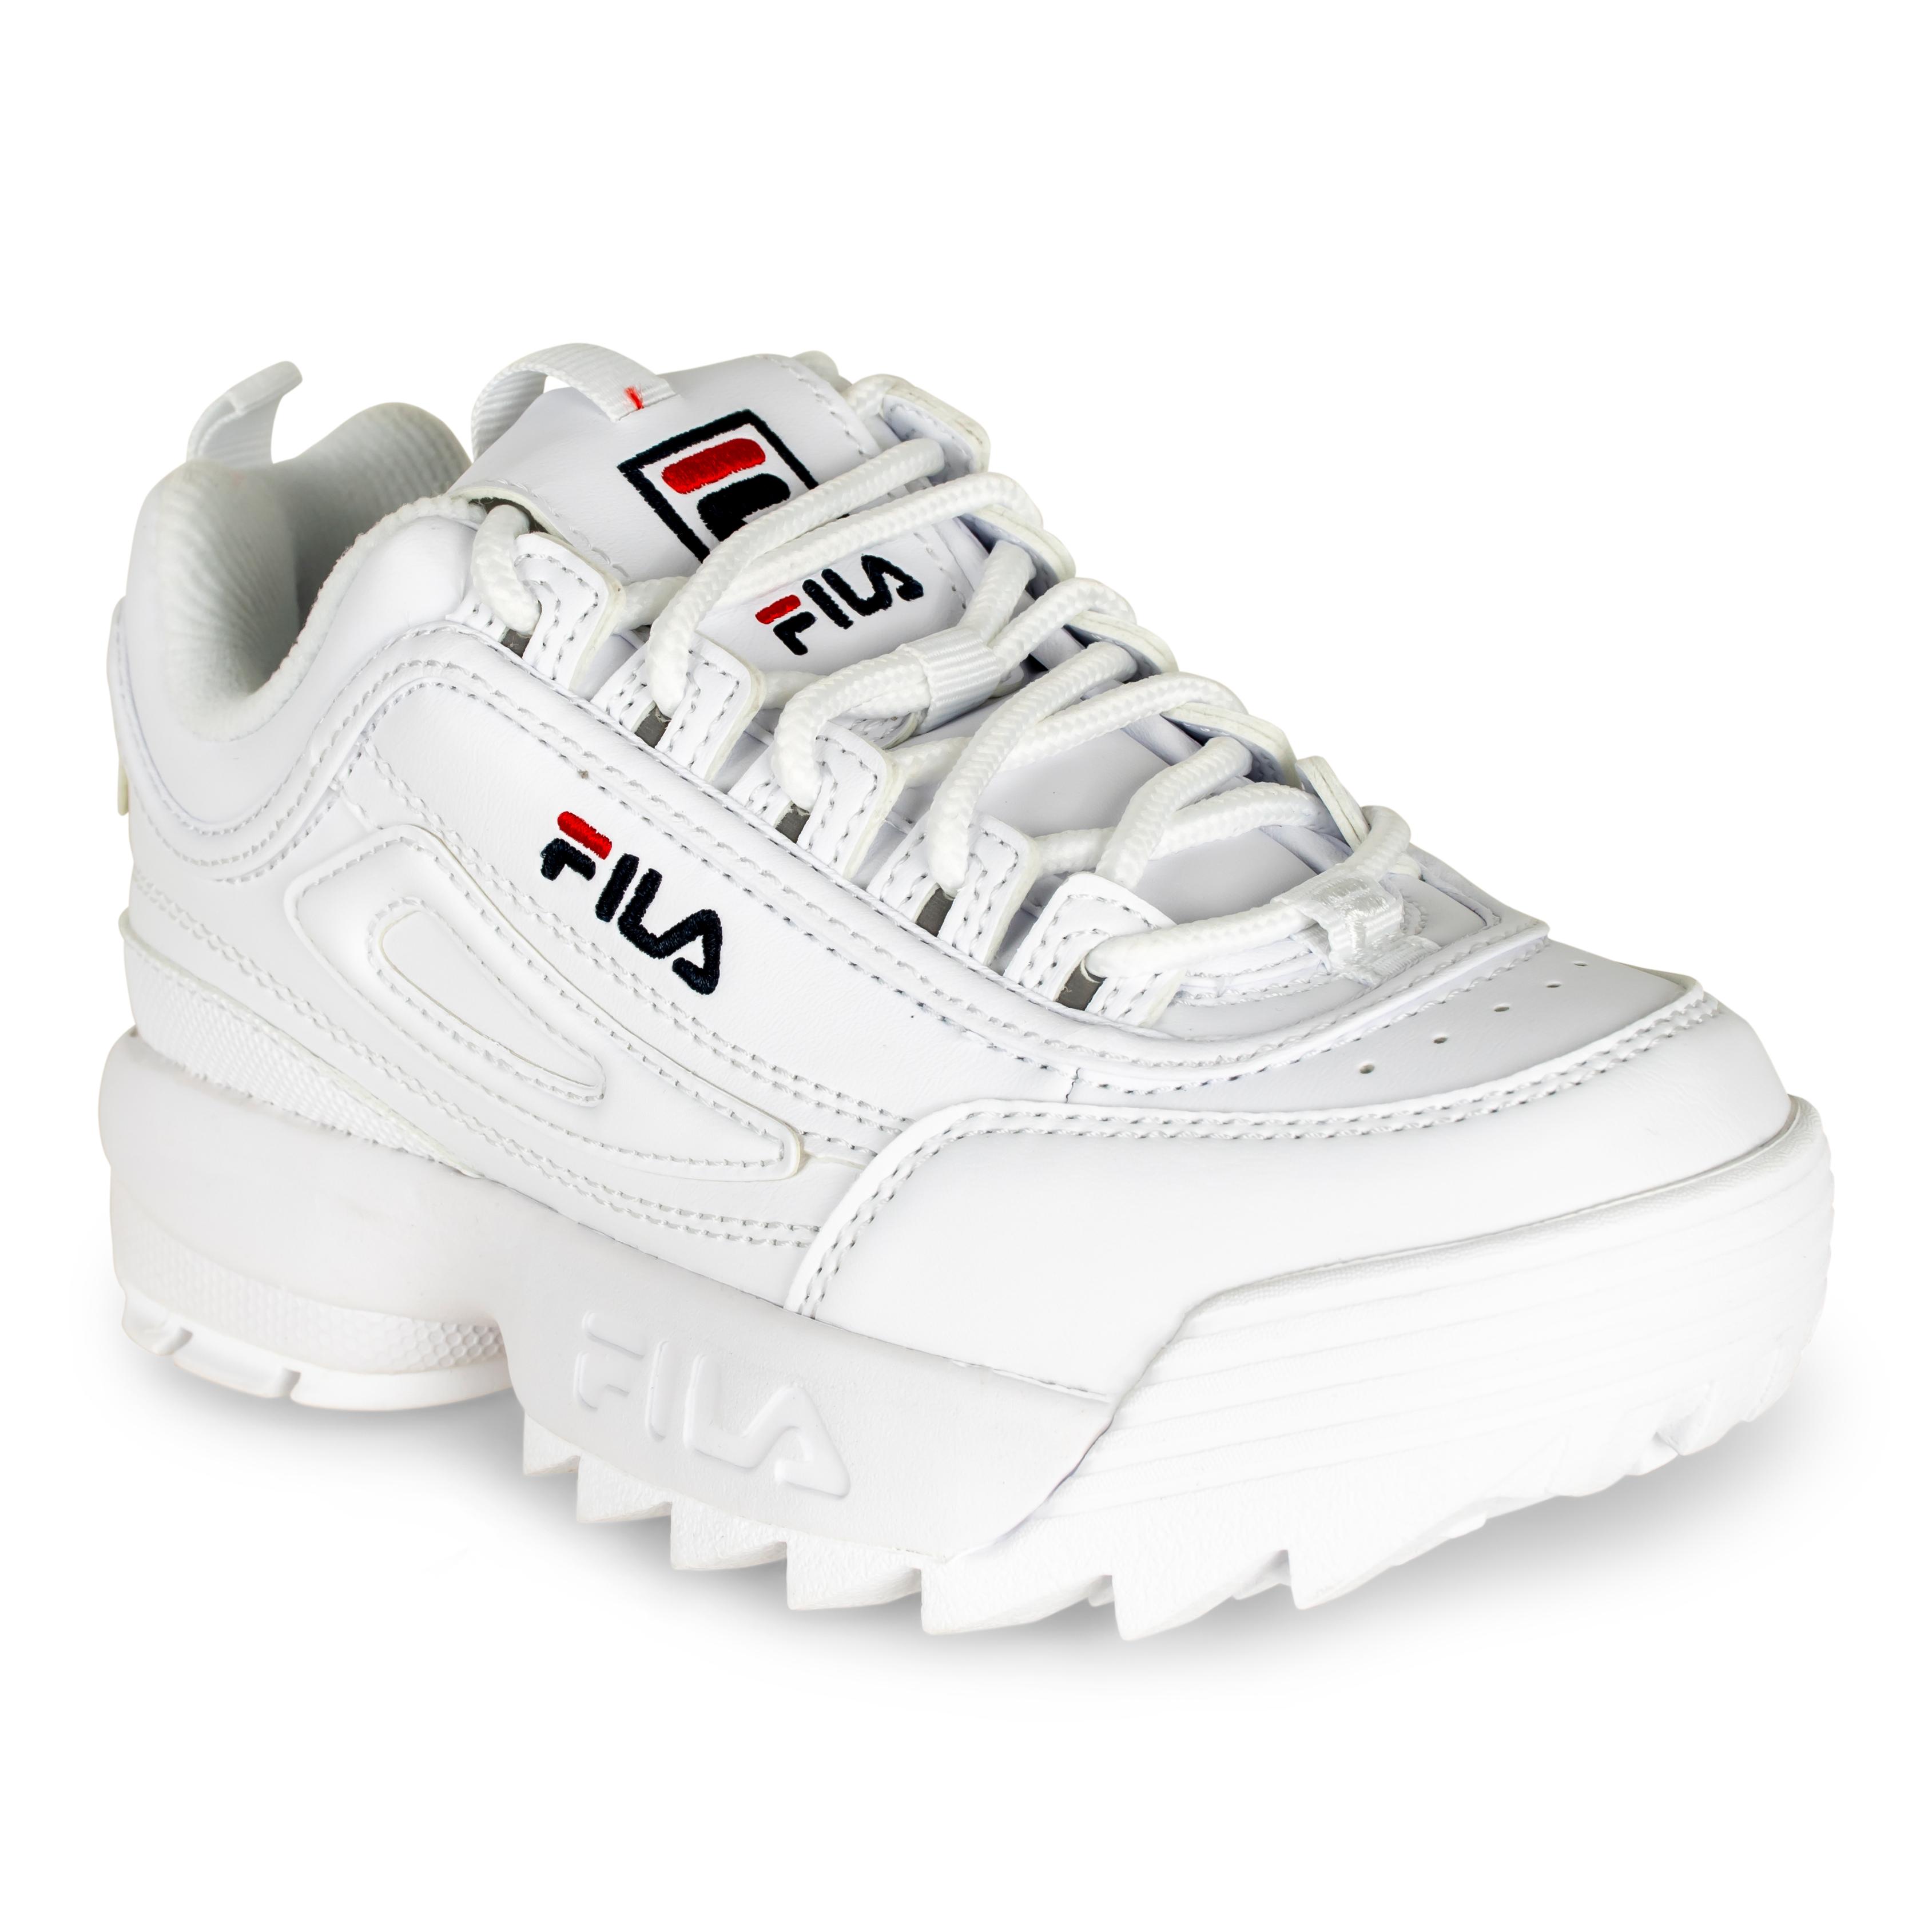 Fila Disruptor Kids sneakers